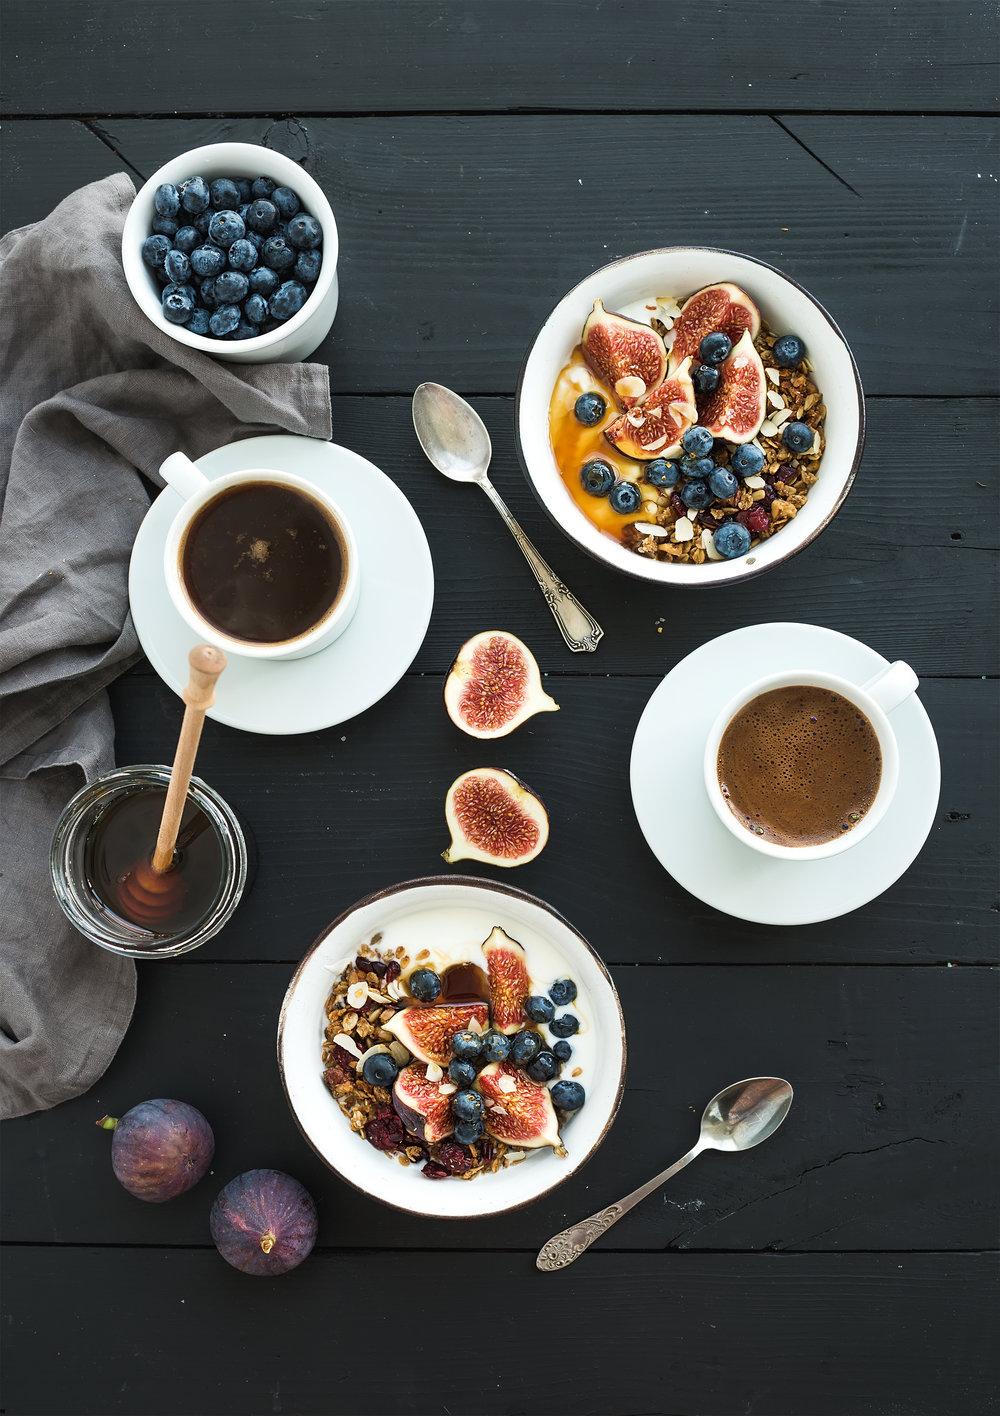 Healthy Breakfast picjpg.jpg